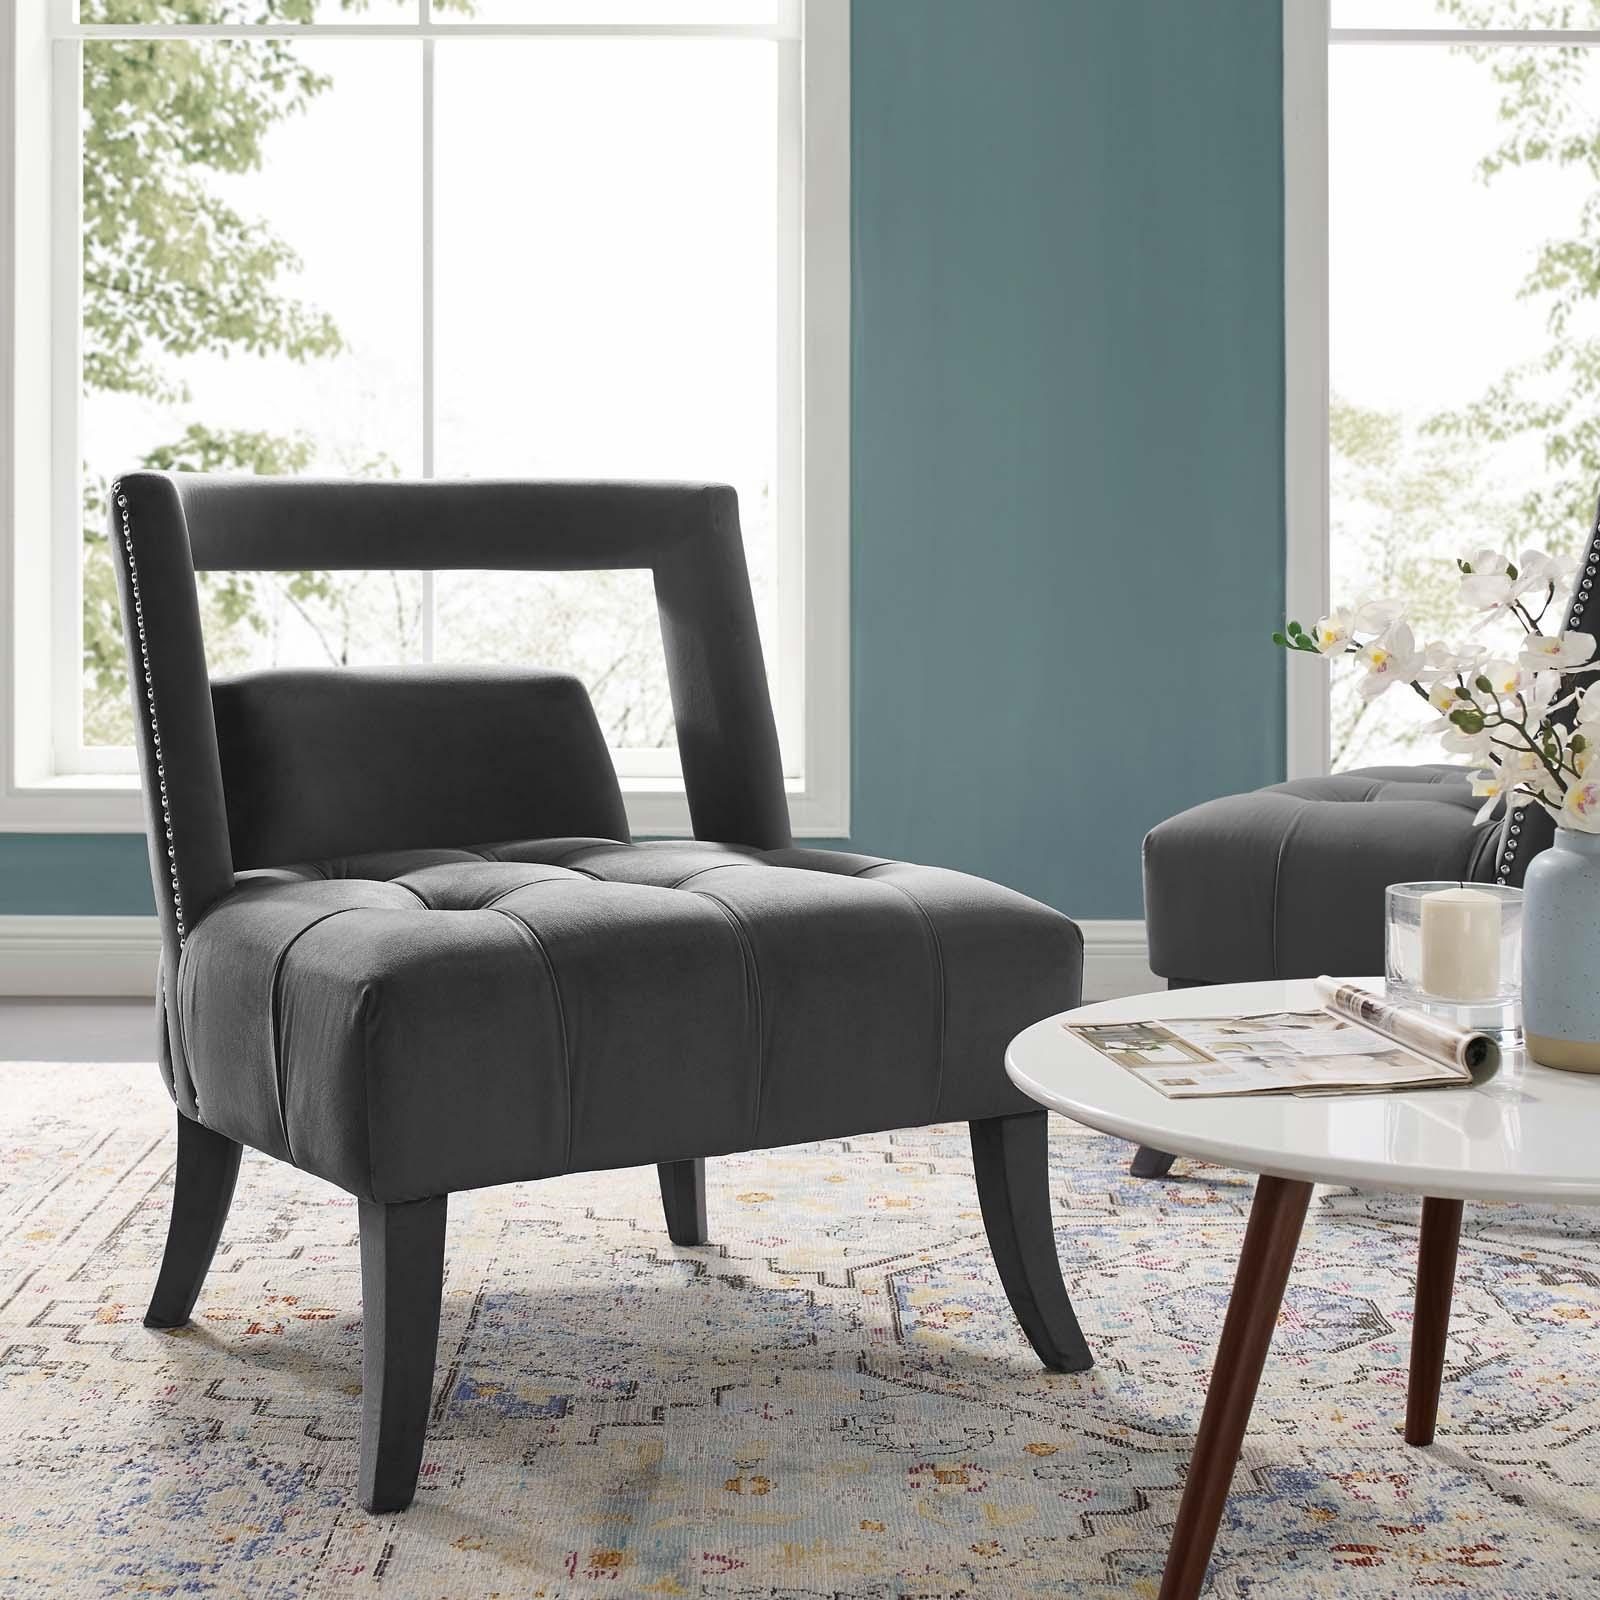 Furniture Factory Outlet Las Vegas: Honor Accent Lounge Grey Velvet Armchair